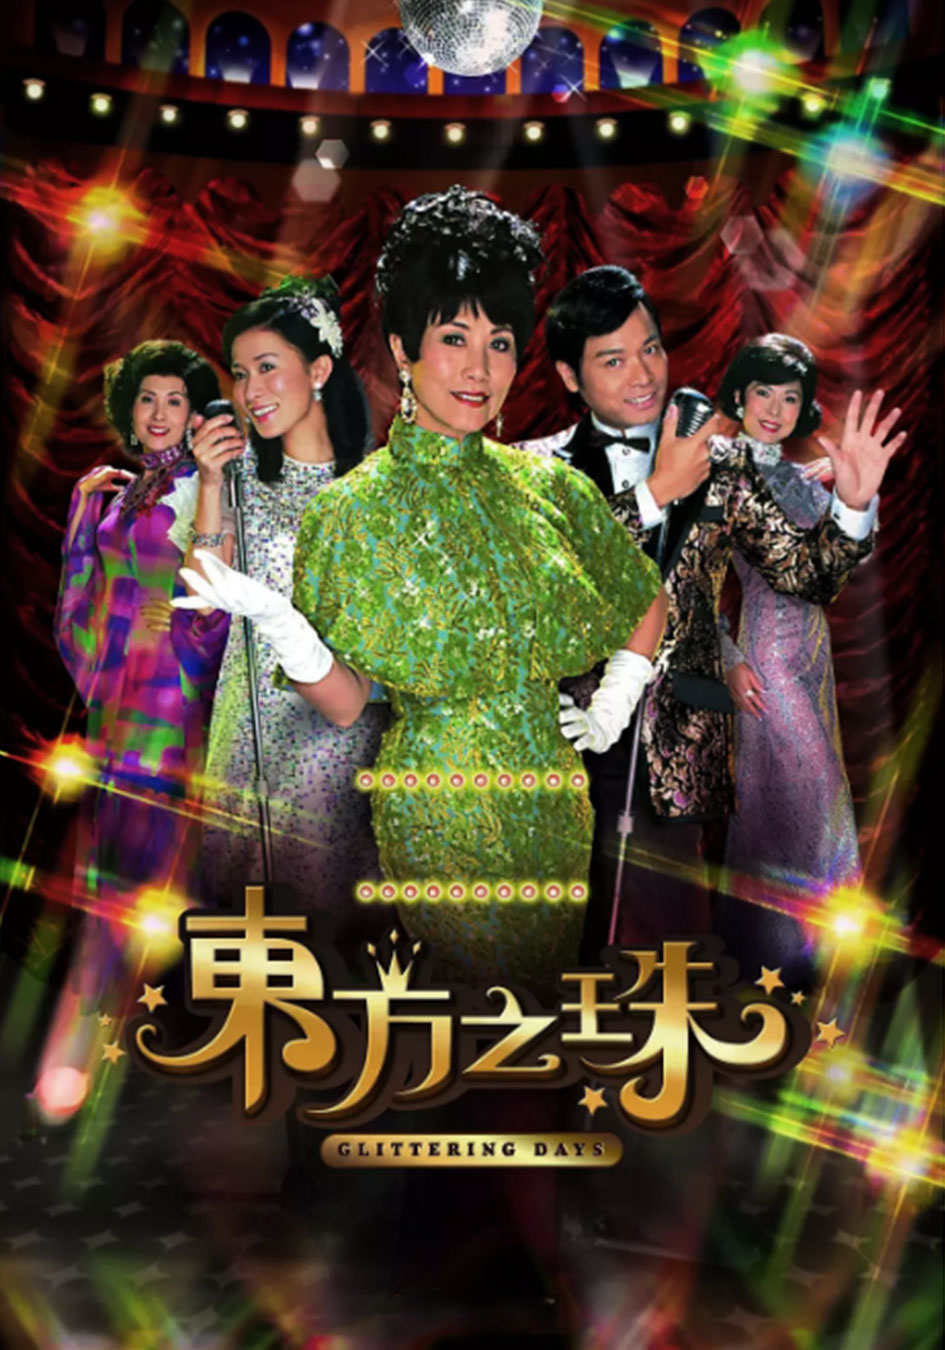 東方之珠-Glittering Days